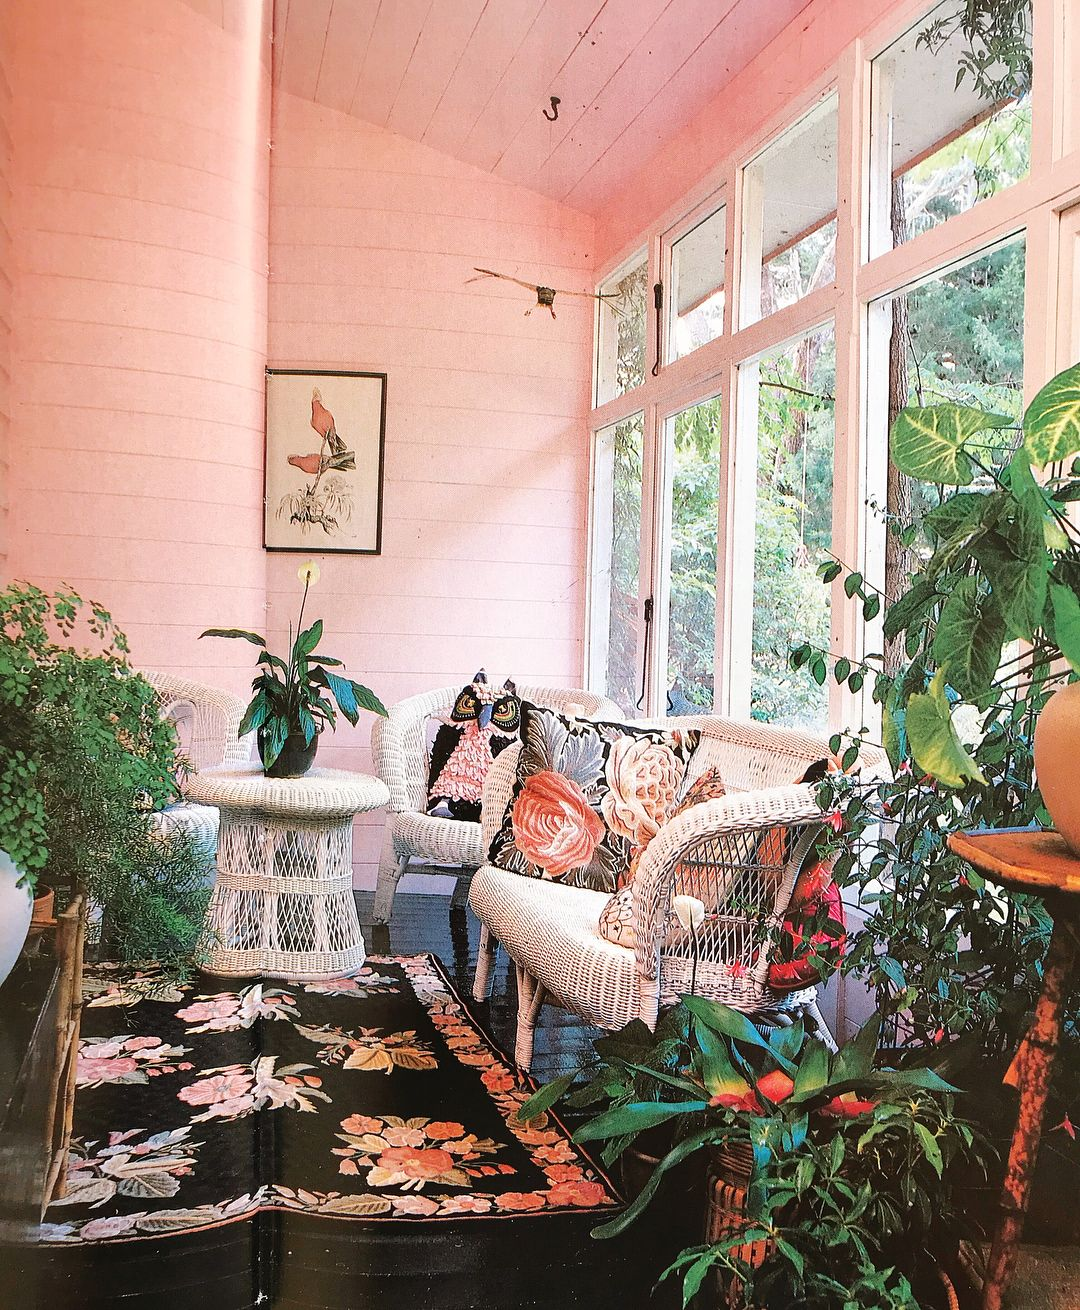 decoration retro rose et plante jardin hiver